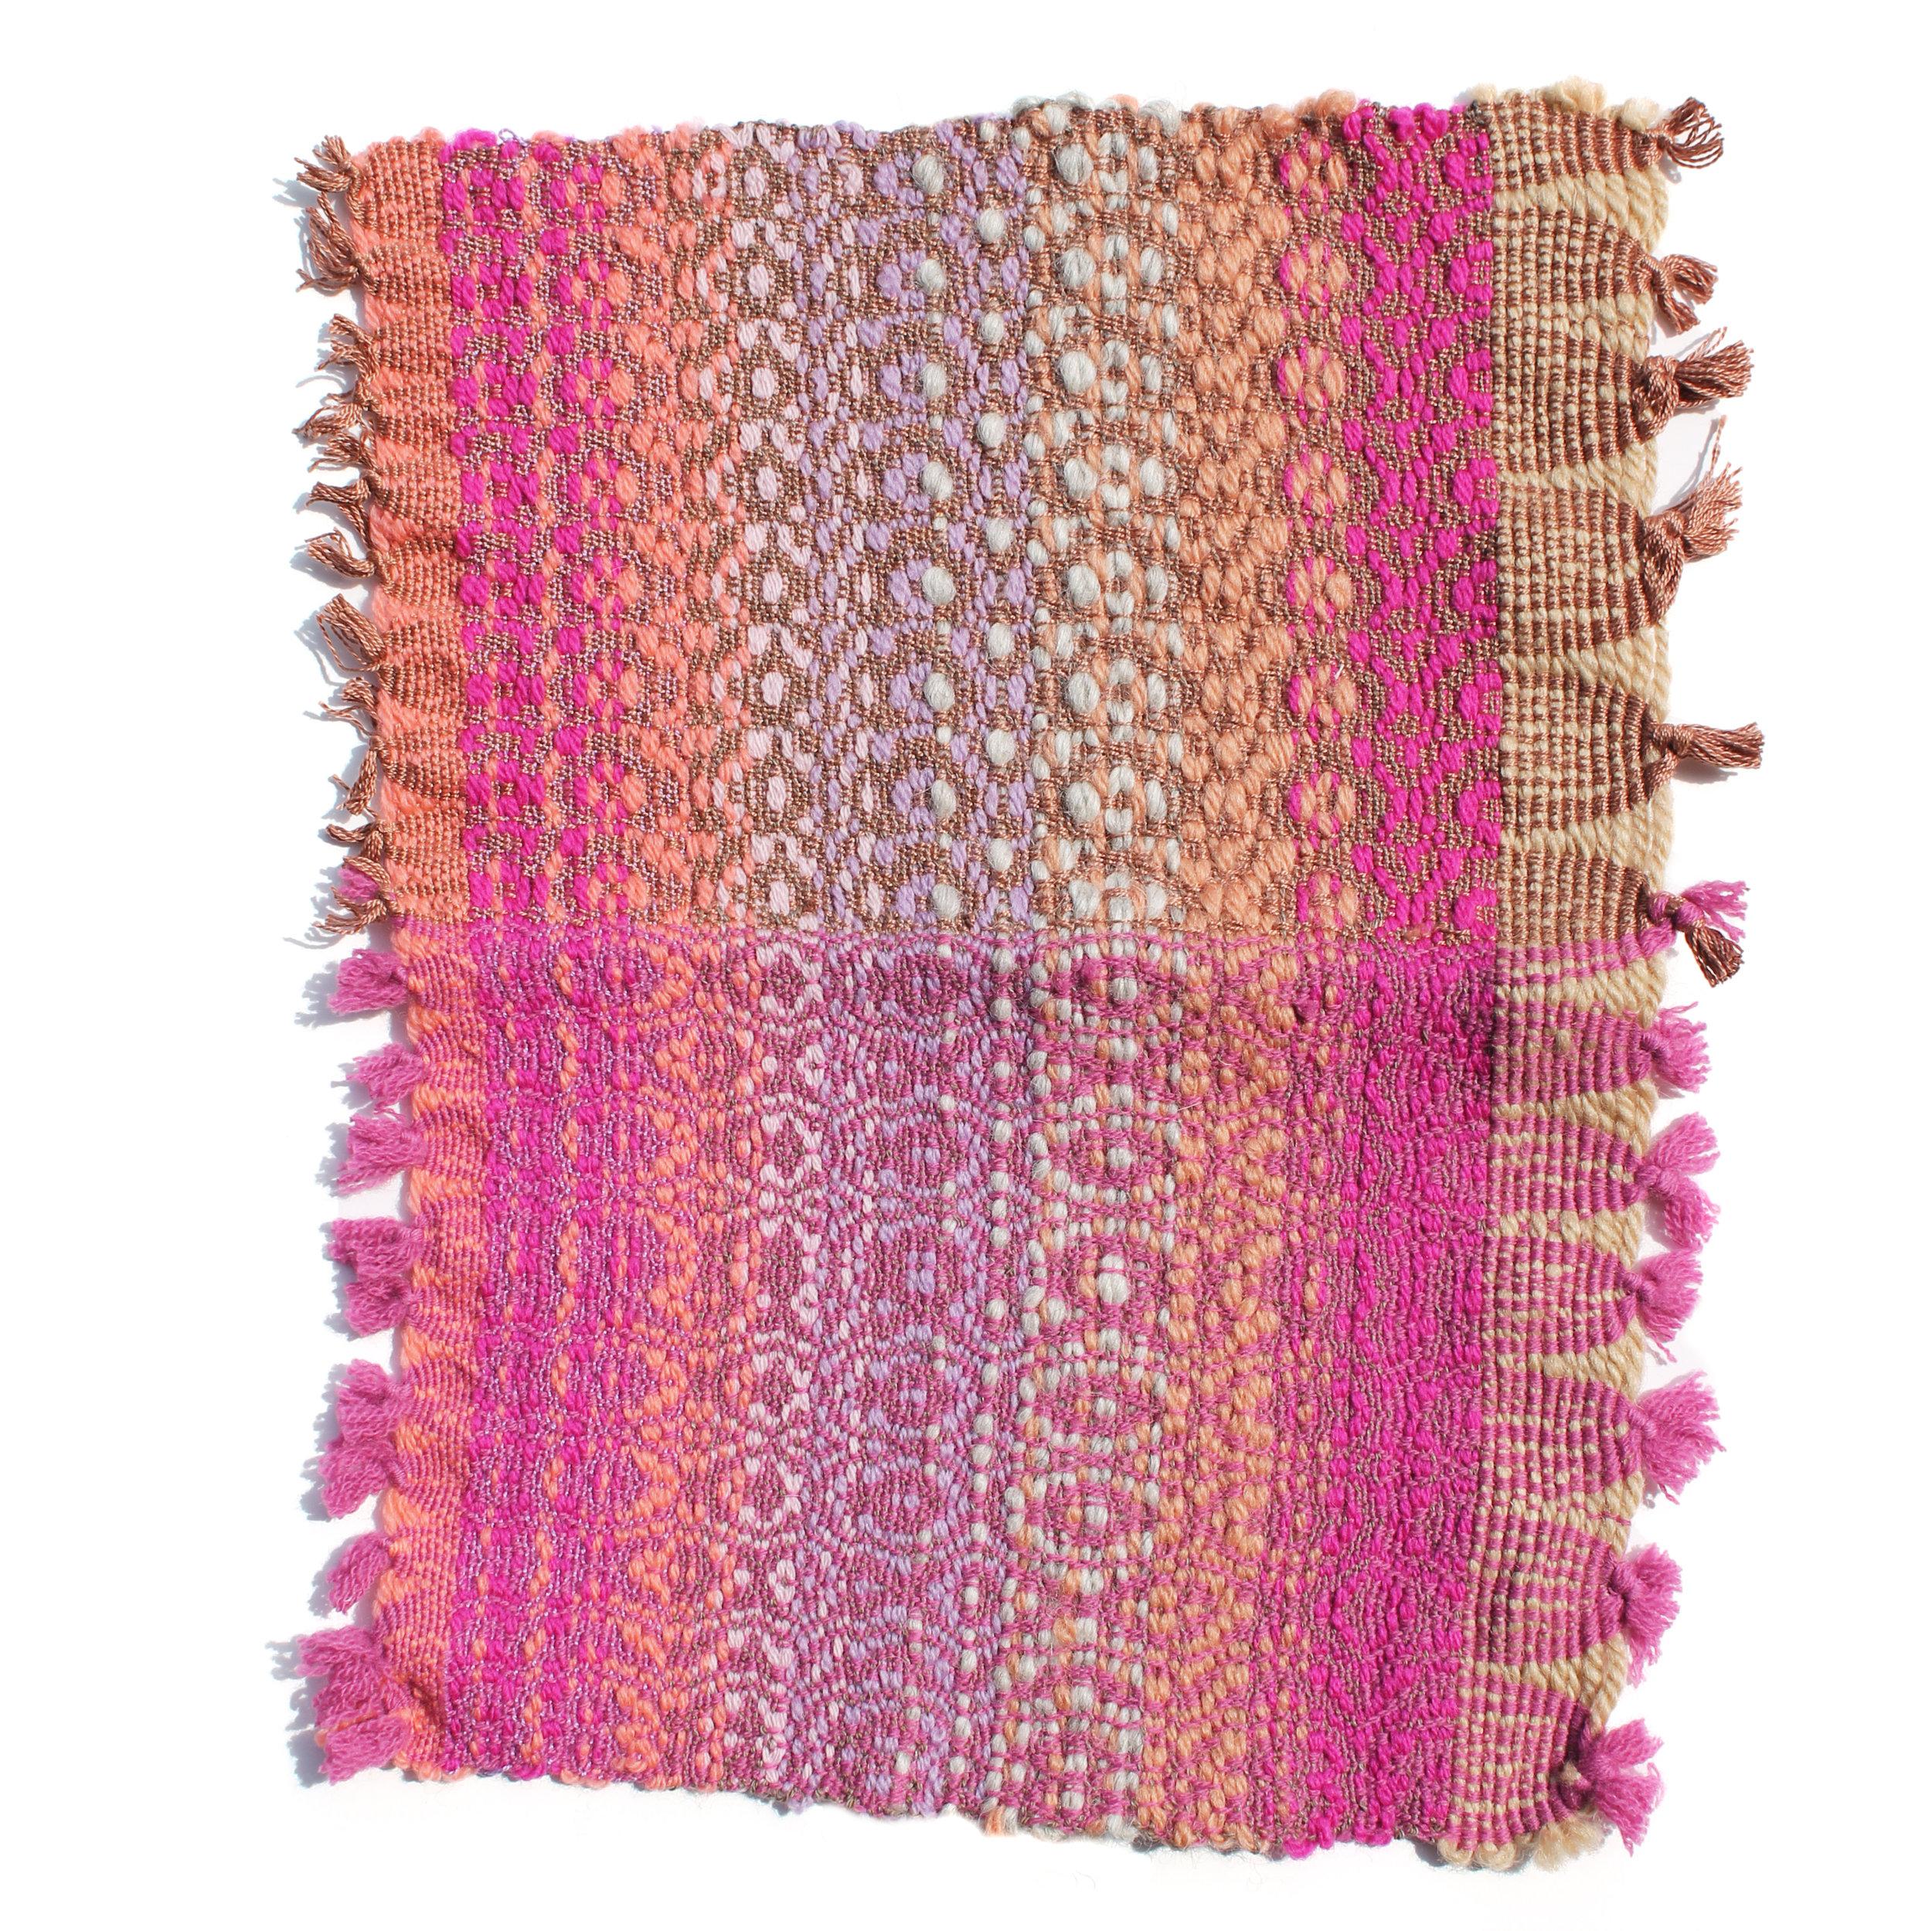 WeavingII_13.jpg